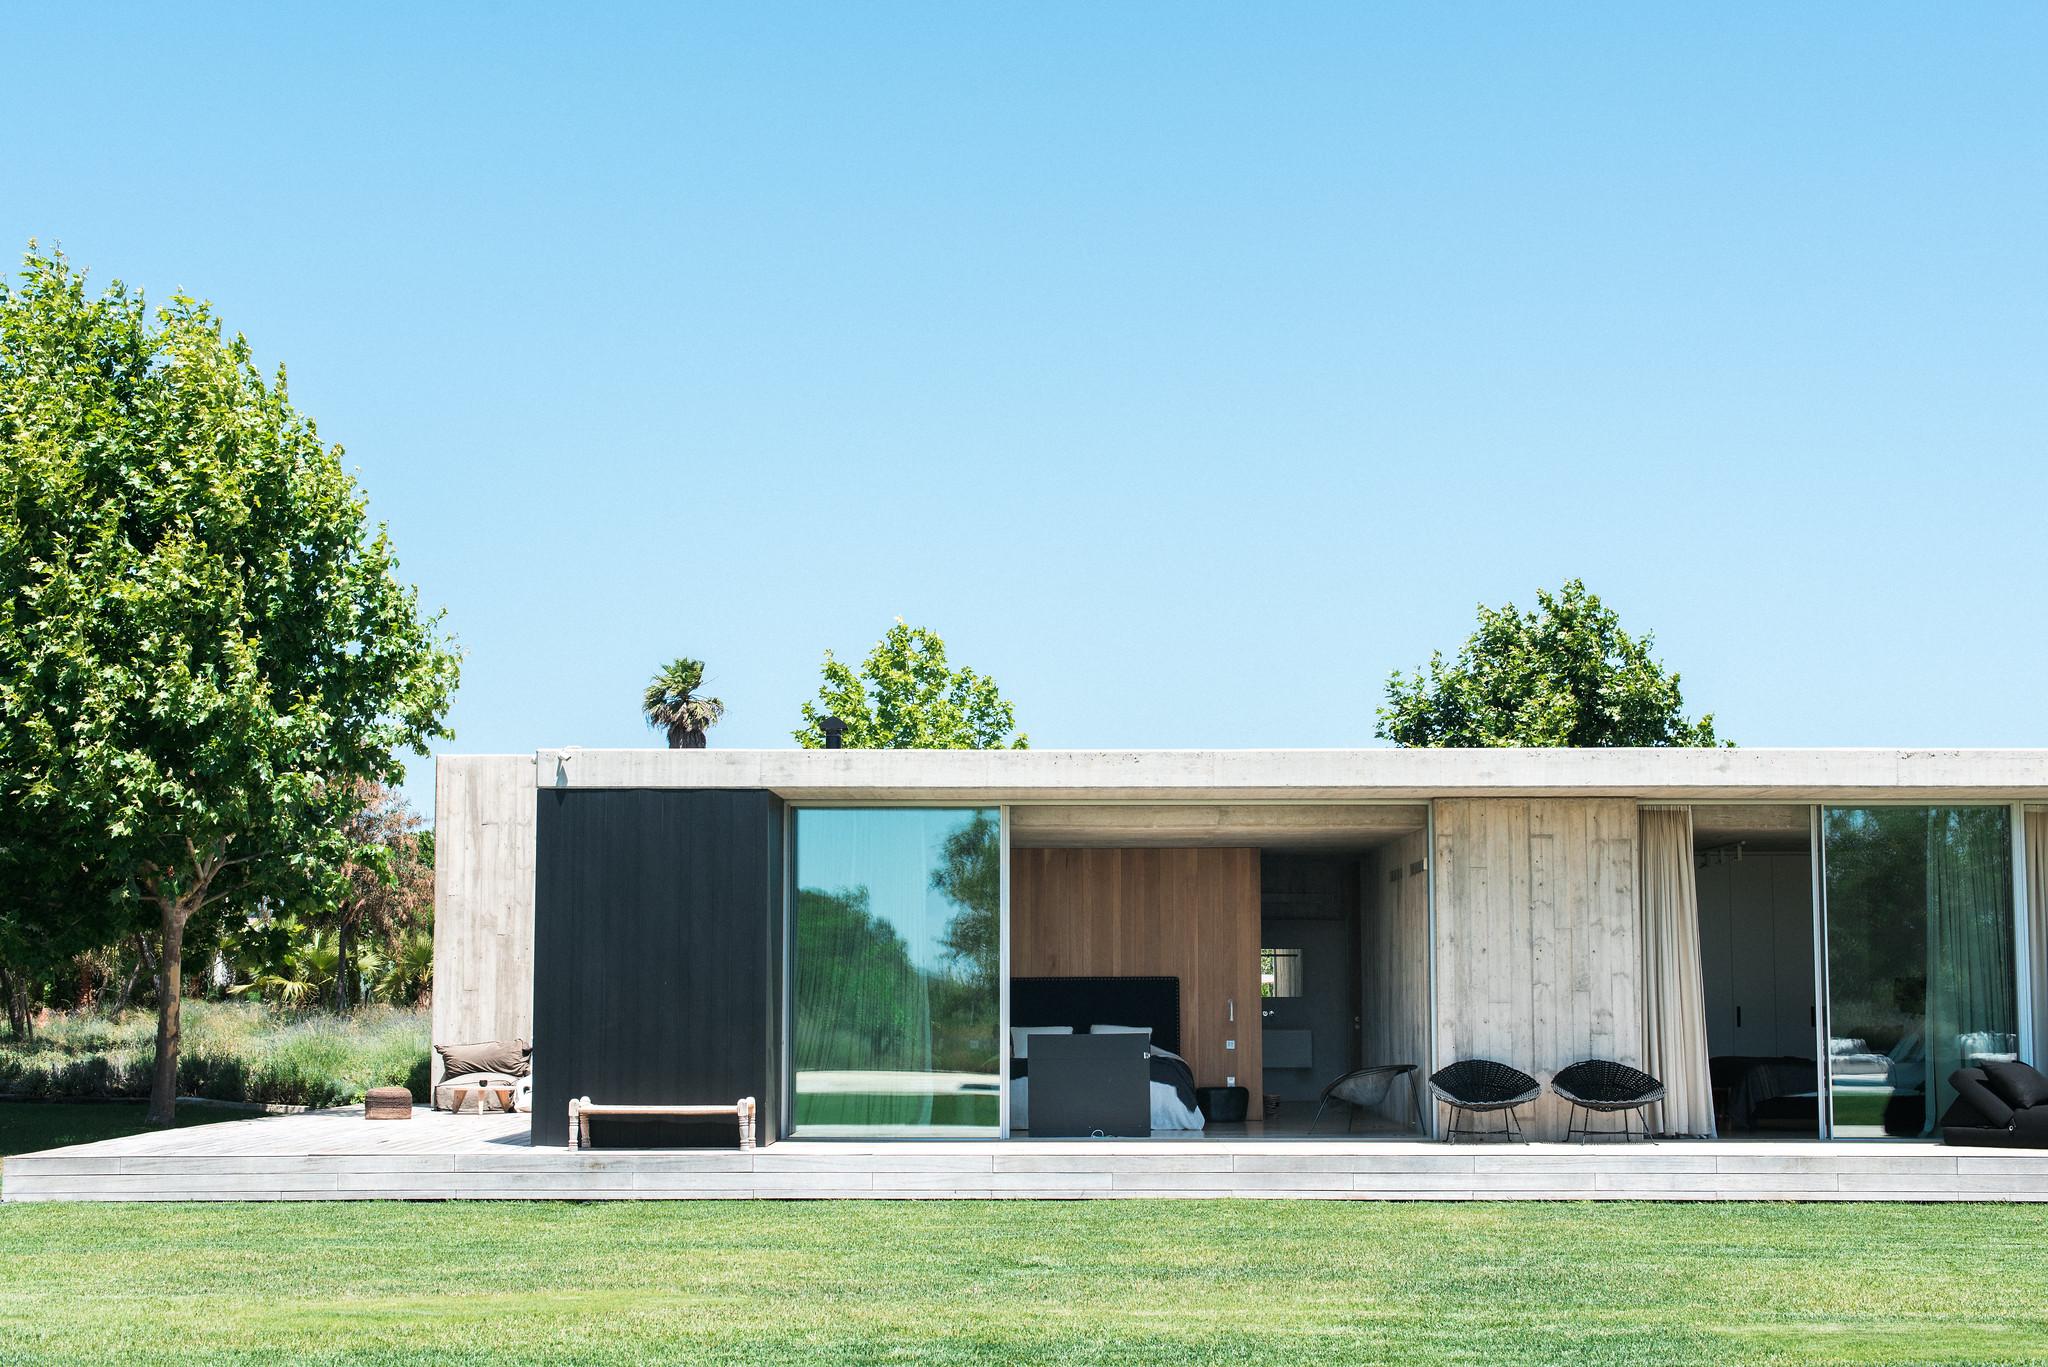 https://www.white-ibiza.com/wp-content/uploads/2020/06/white-ibiza-villas-casa-valentina-exterior-rooms.jpg